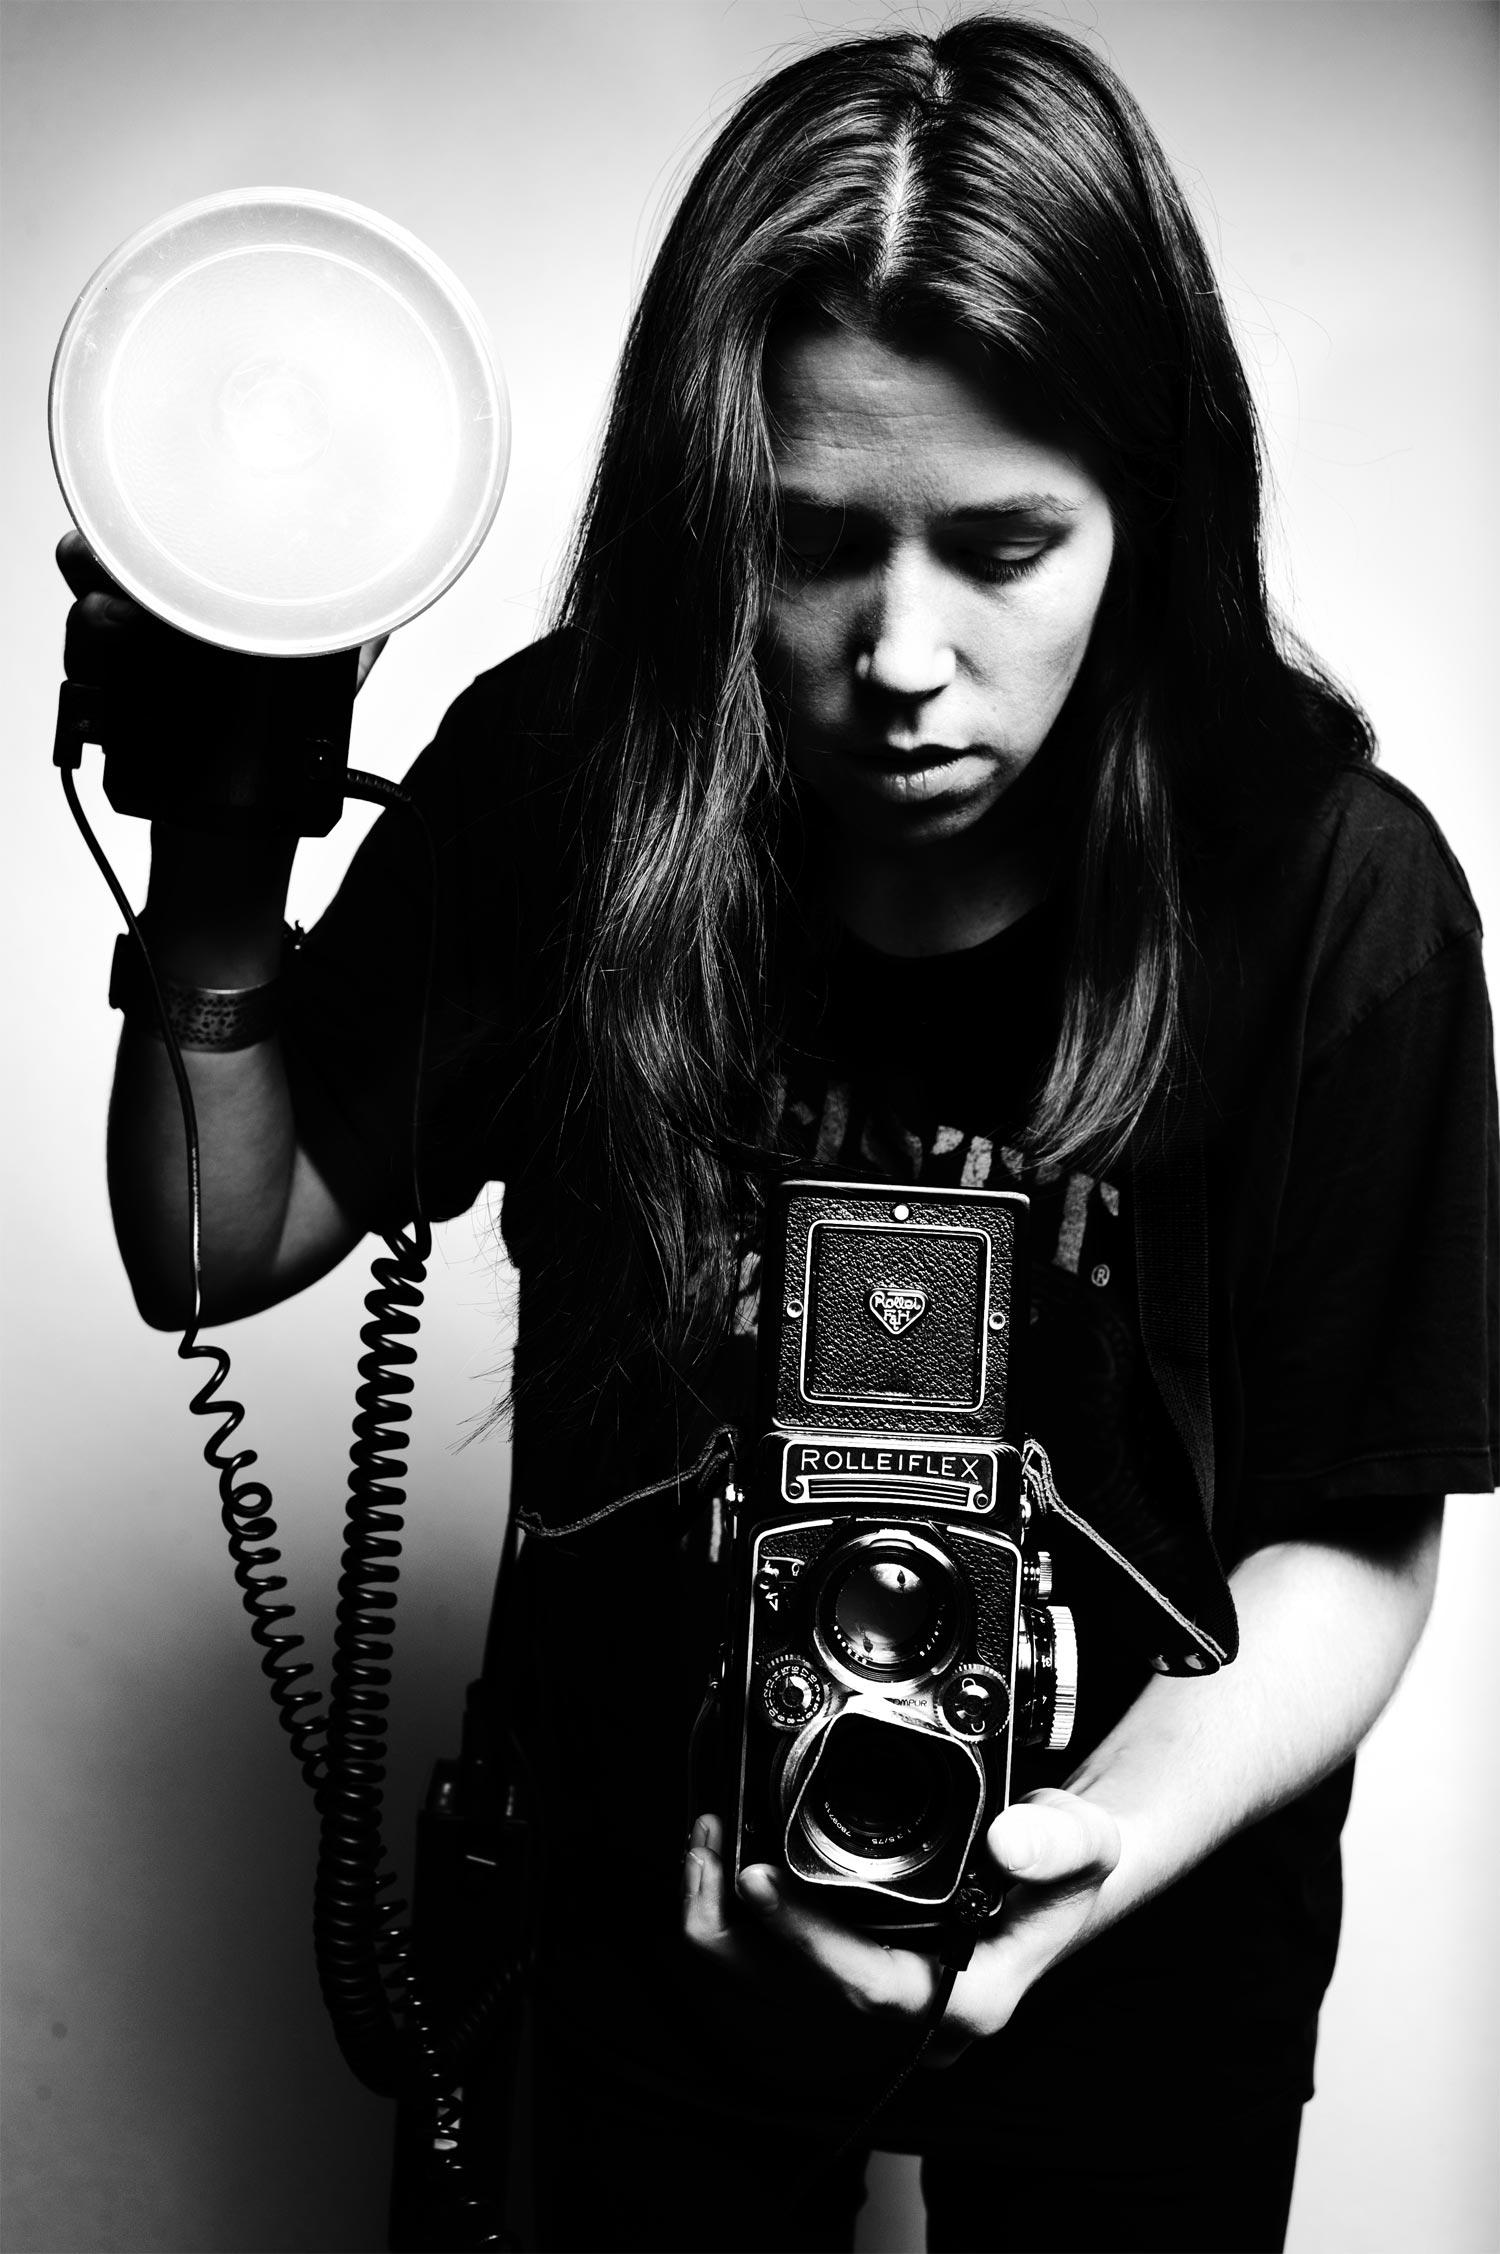 Melanie King Rolleiflex and Strobe